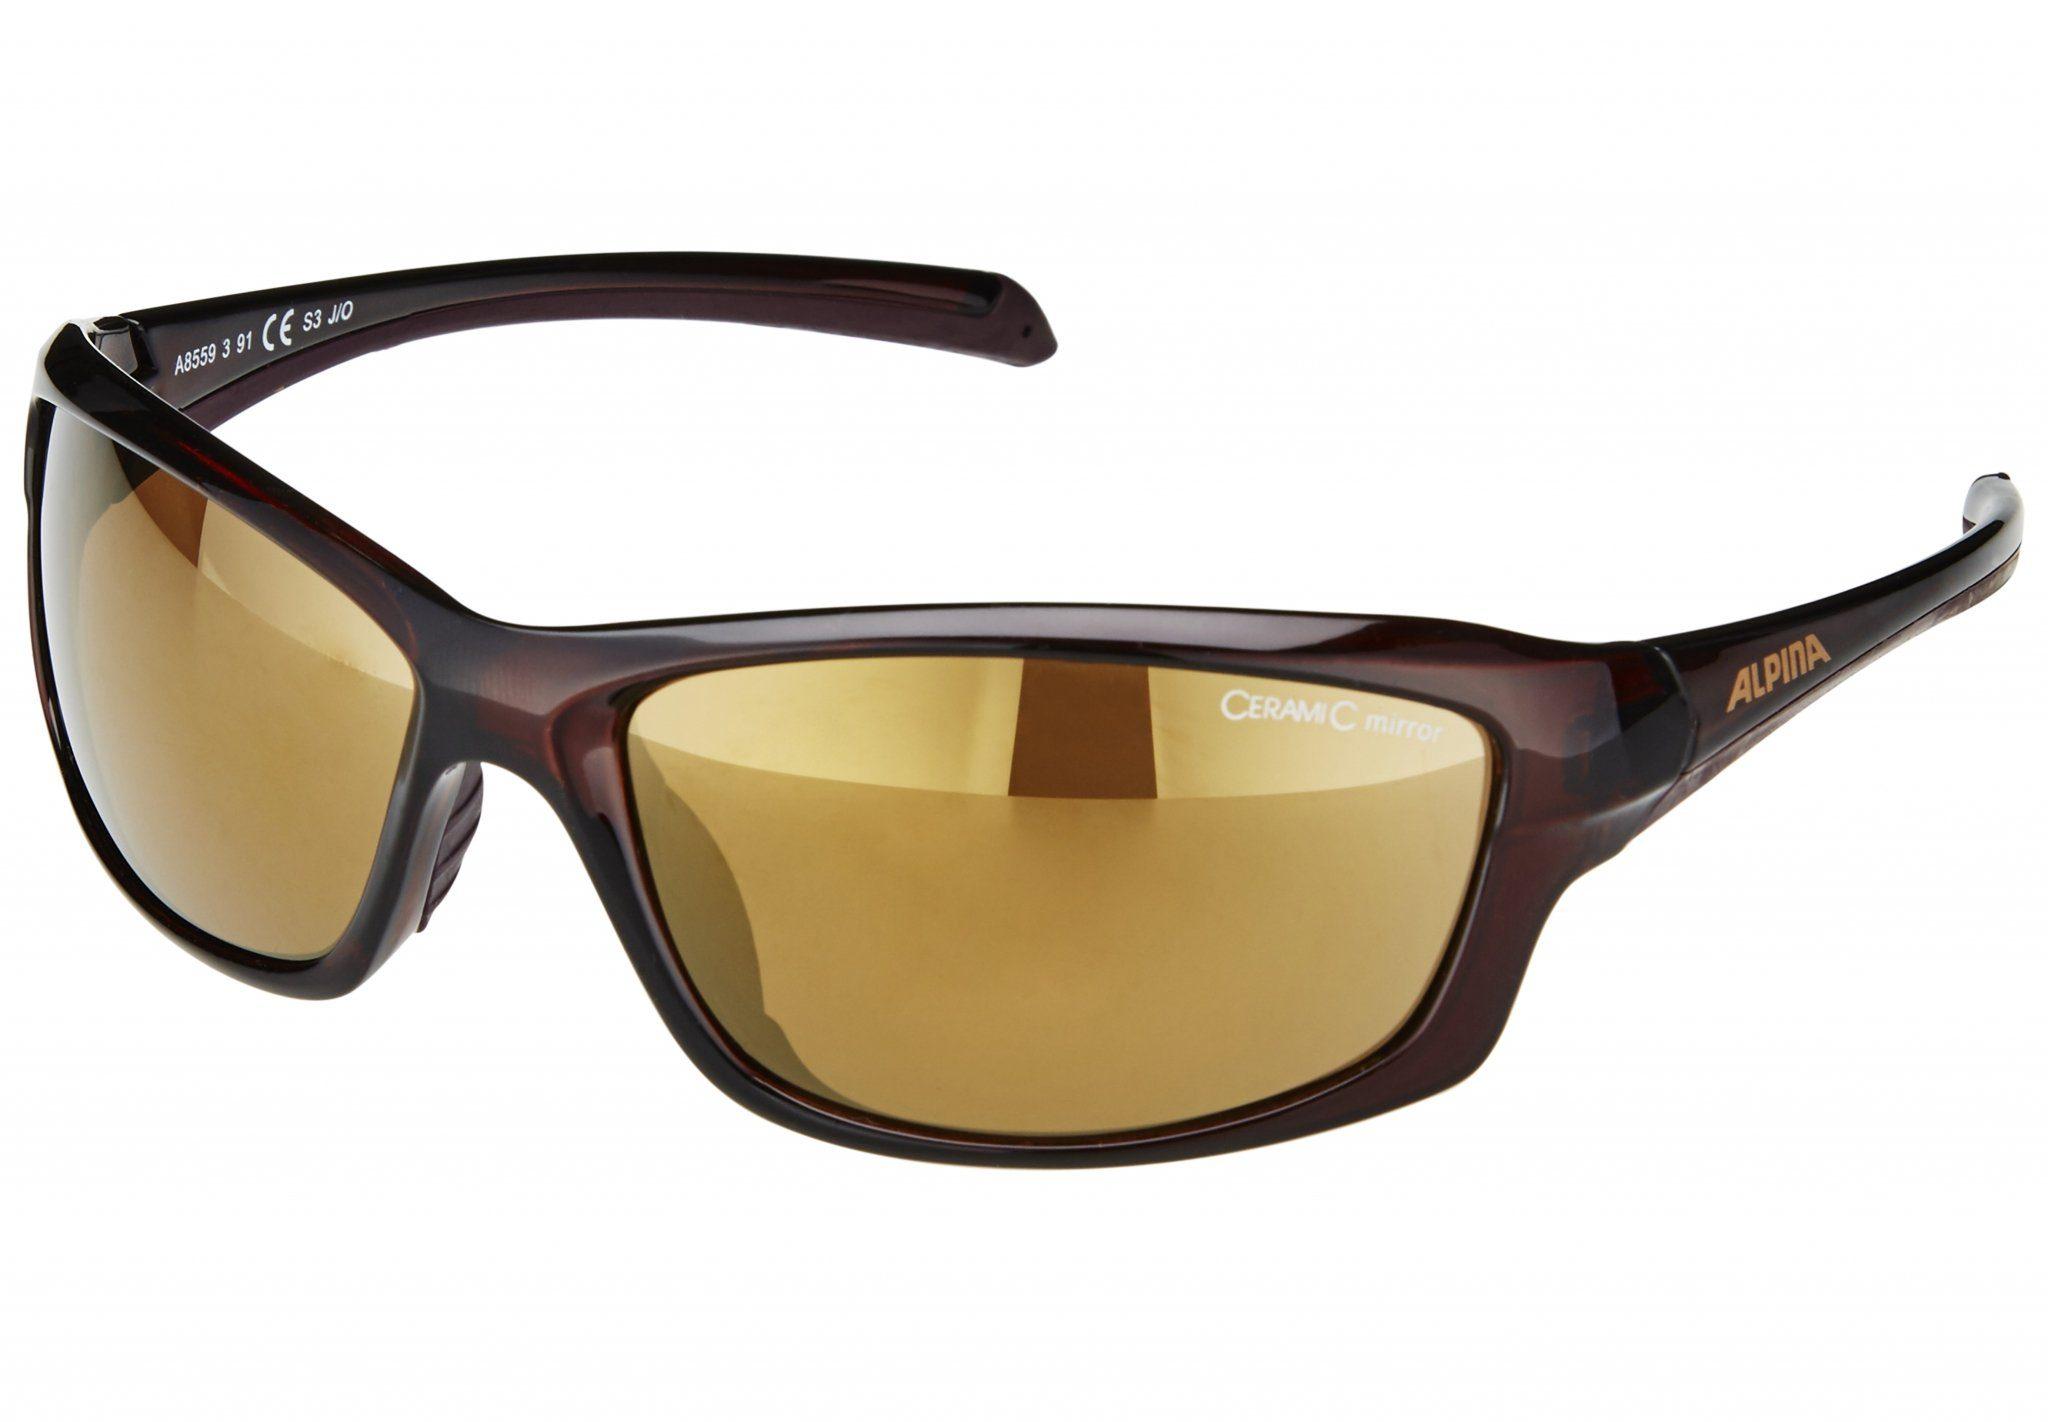 Alpina Radsportbrille »Alpina Dyfer«